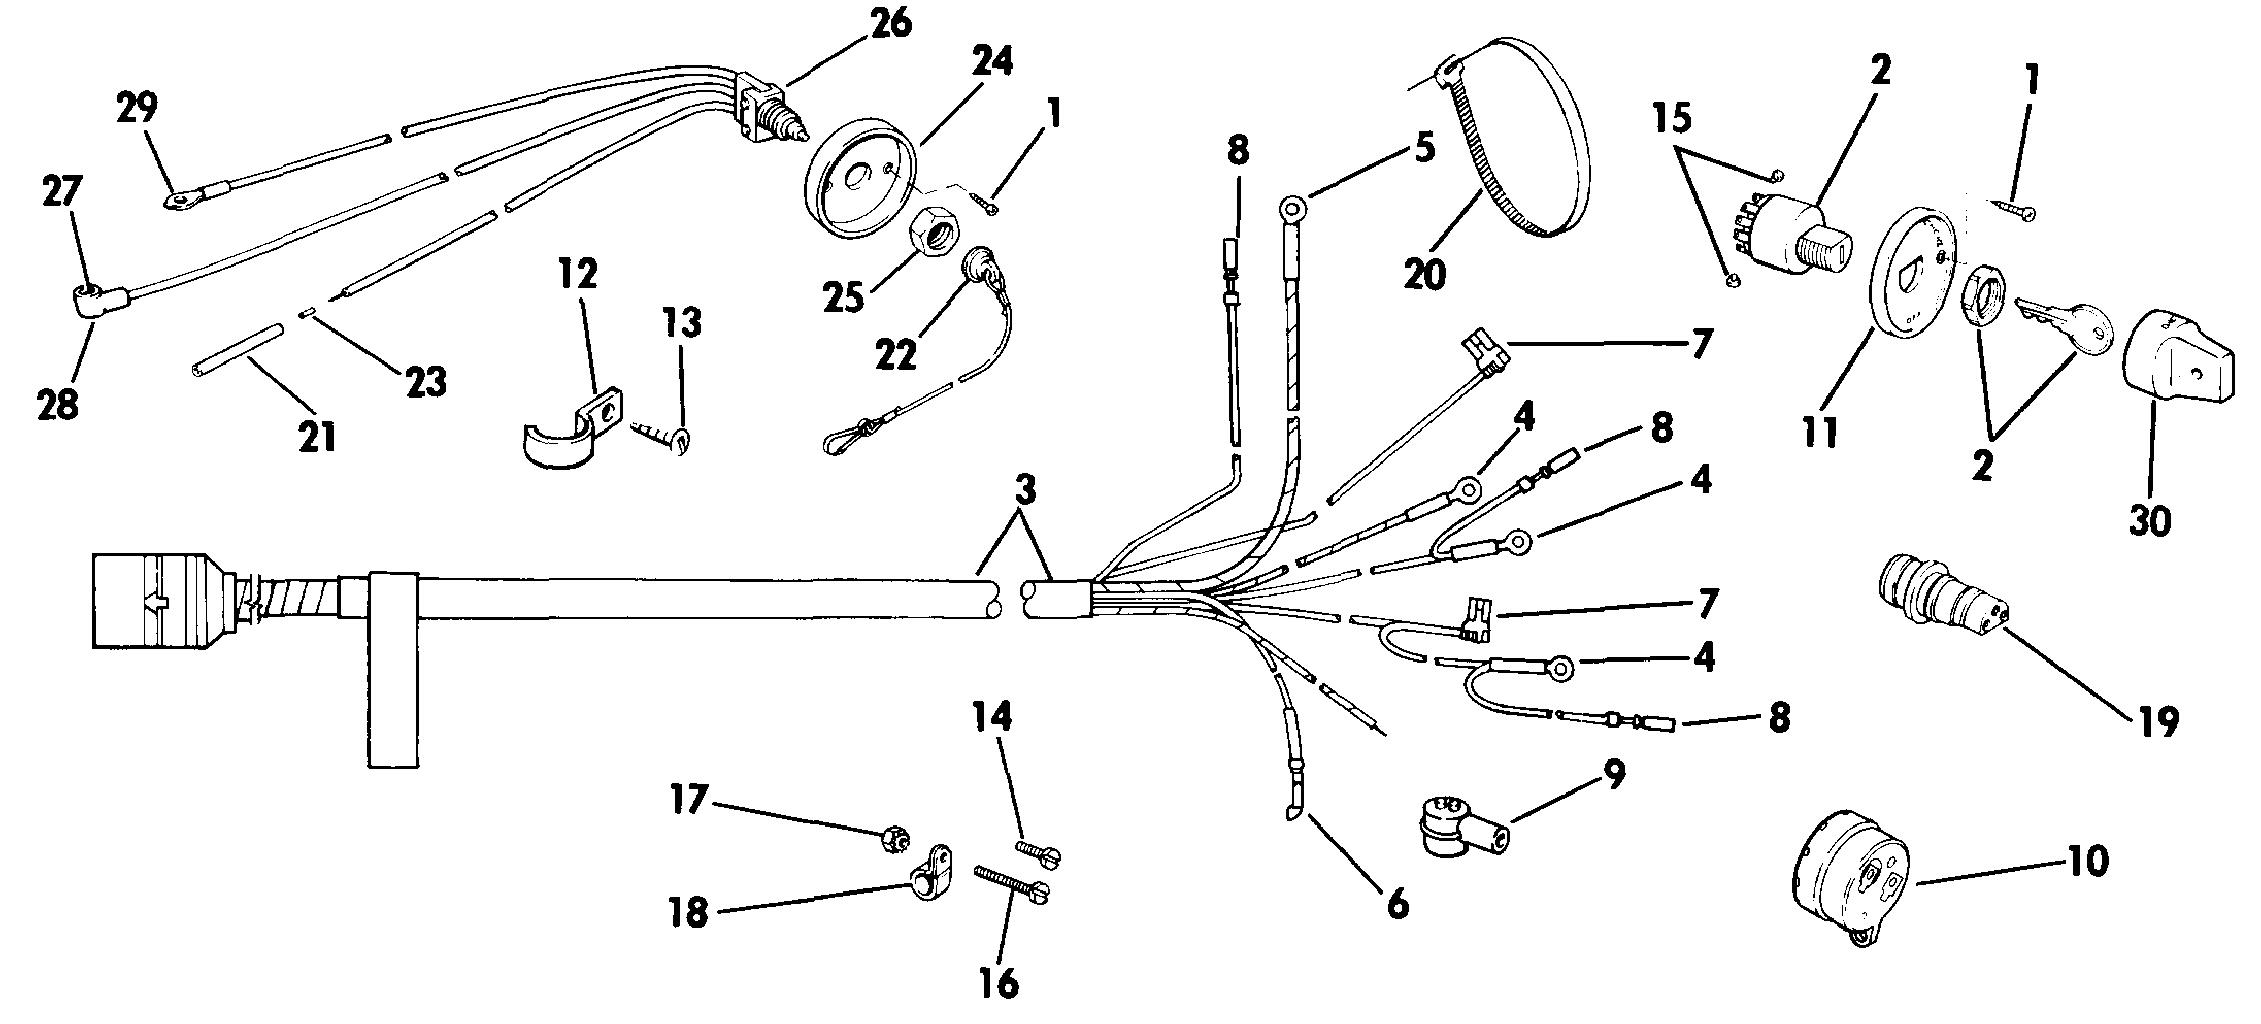 Omc Wiring Diagram